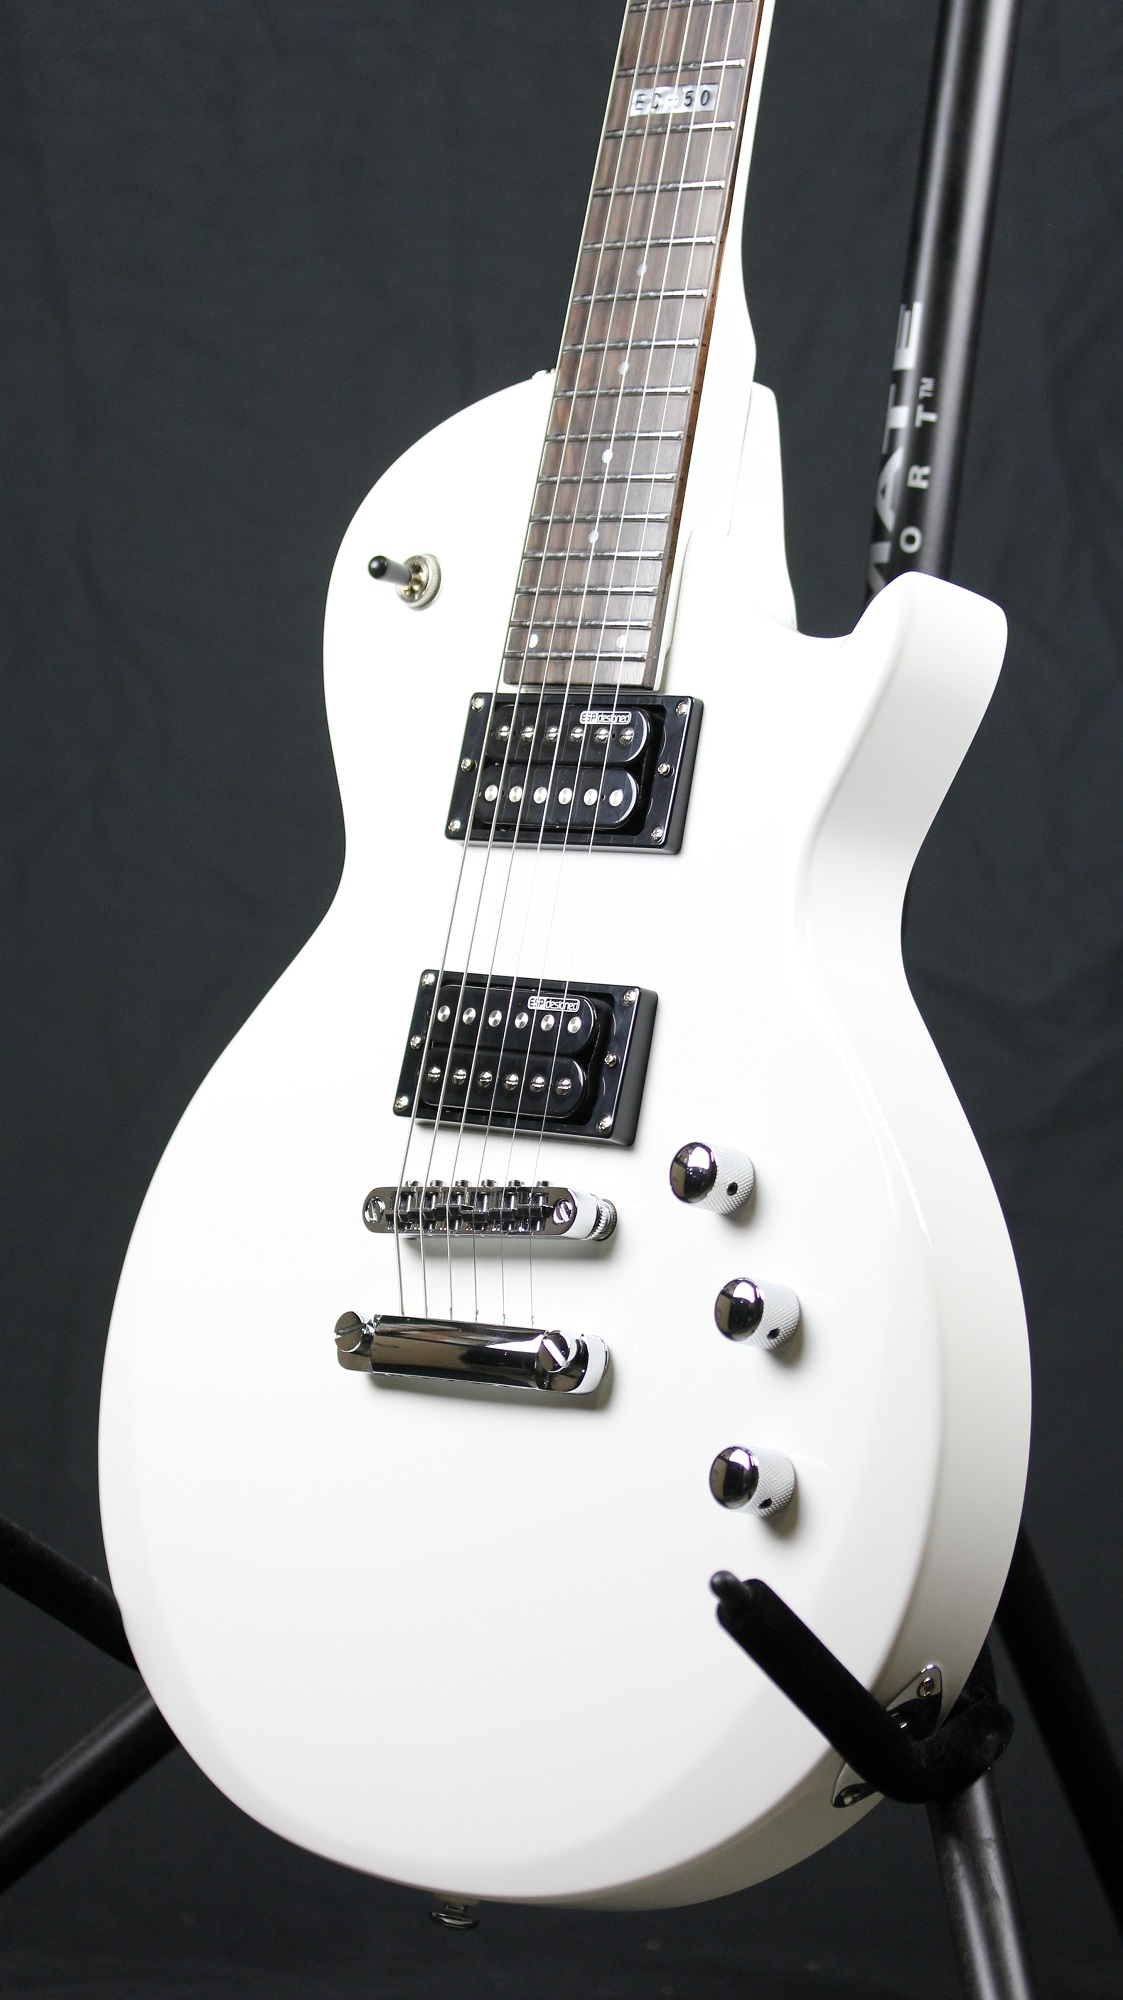 esp ltd ec 50 wiring diagram 2 pin flasher relay snow white sample prototype electric guitar